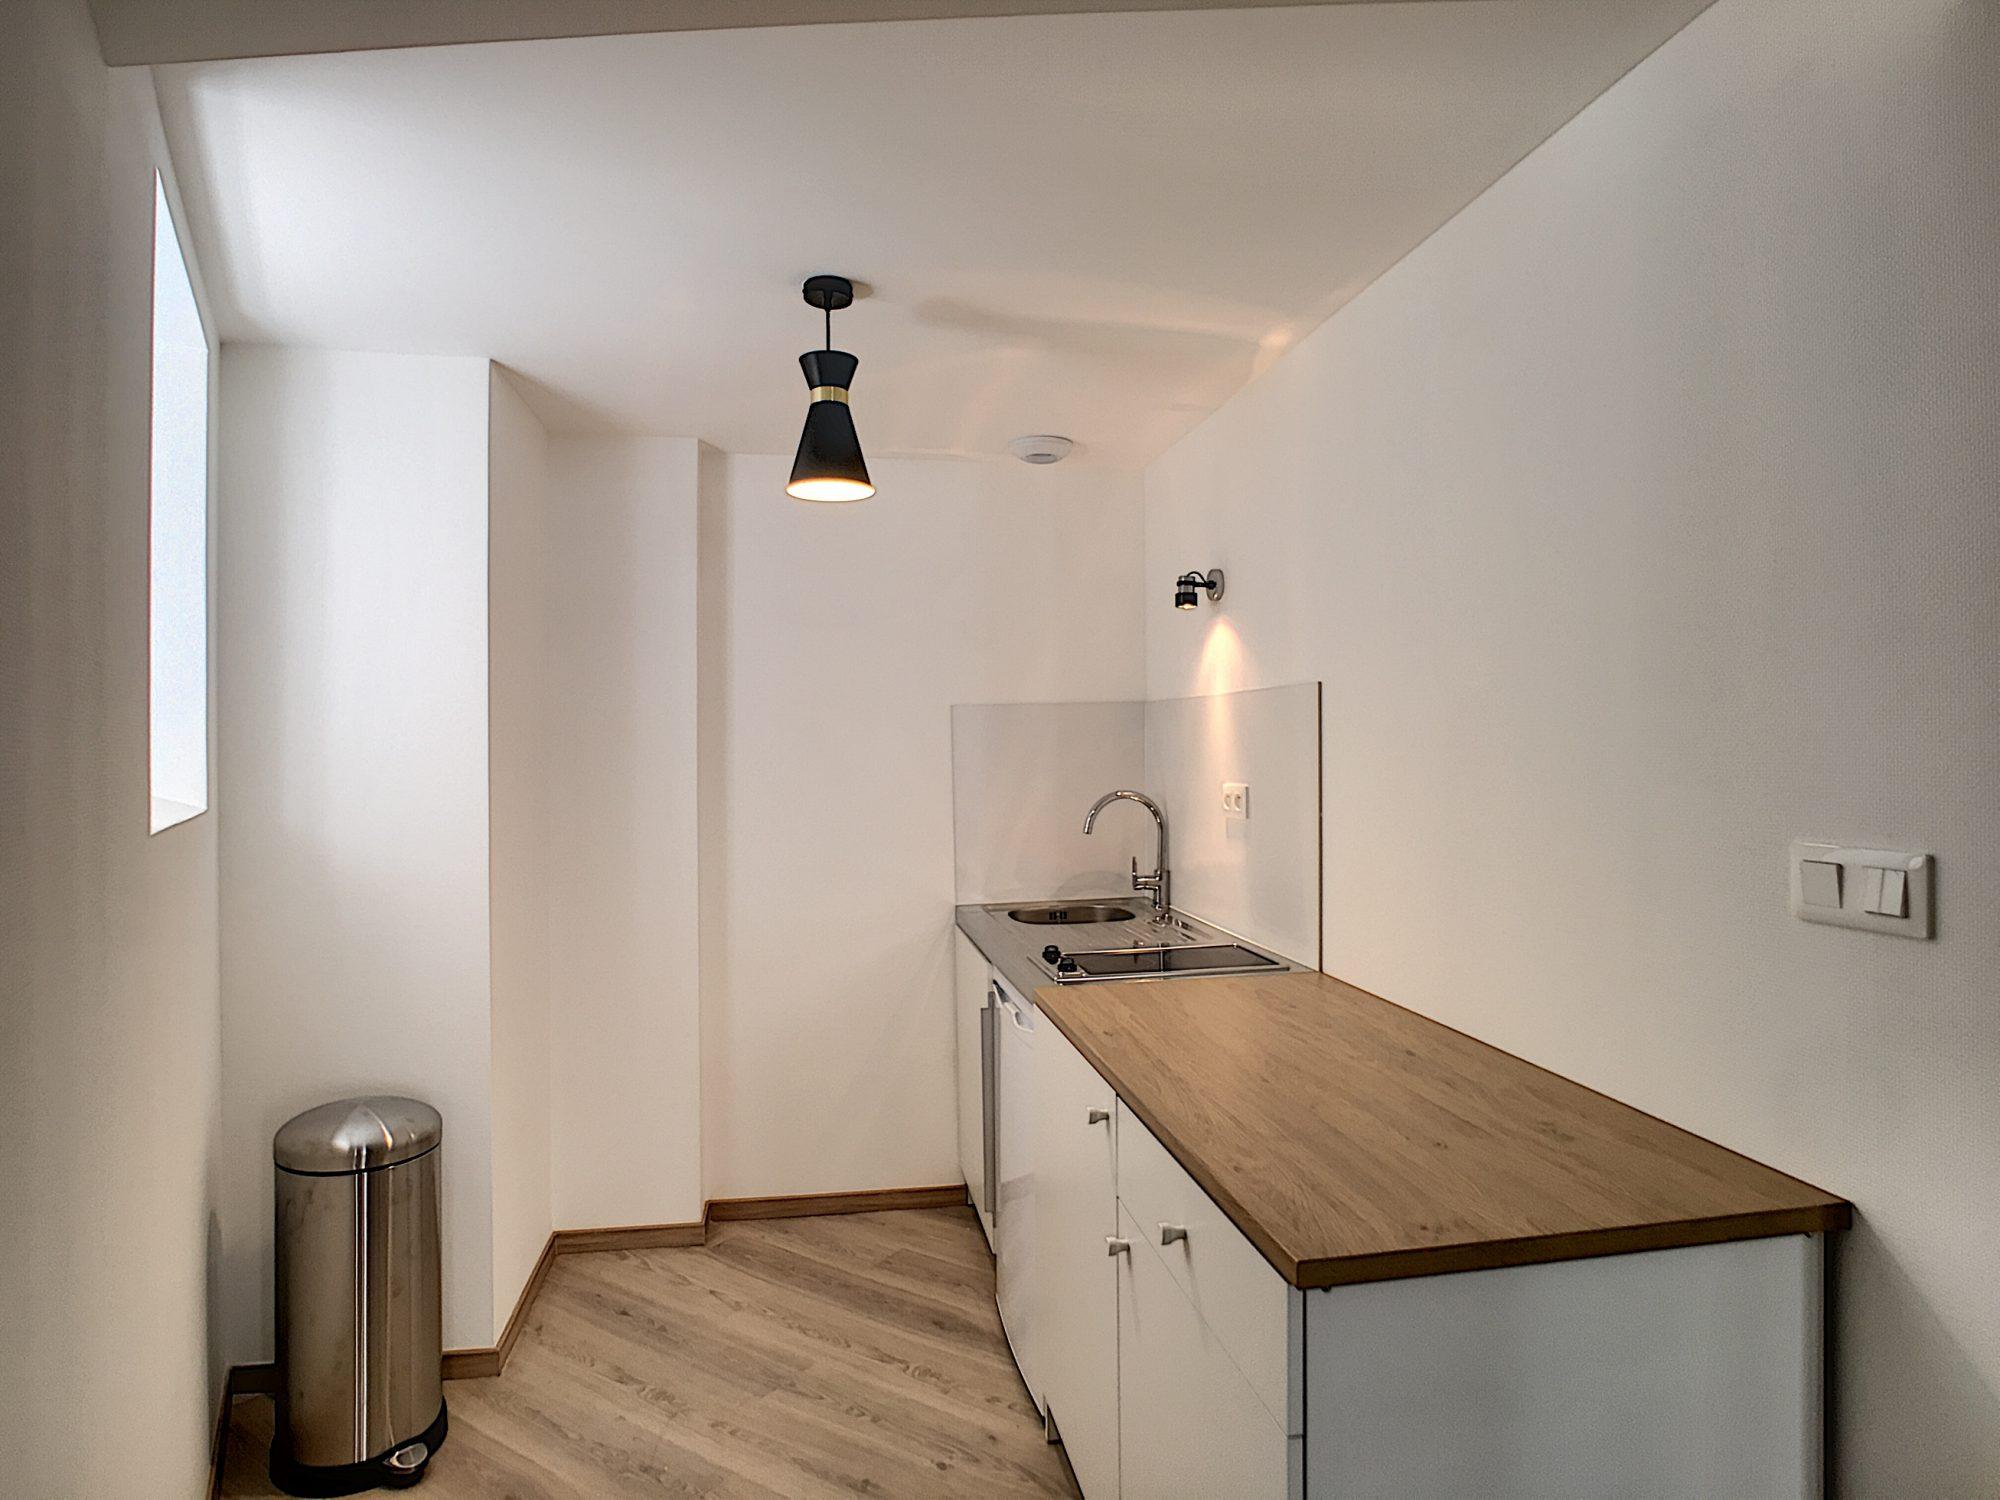 [Atypique] Splendide 2 pièces meublé avec terrasse – Petite France / quai Turckheim - nos locations - Beausite Immobilier 6